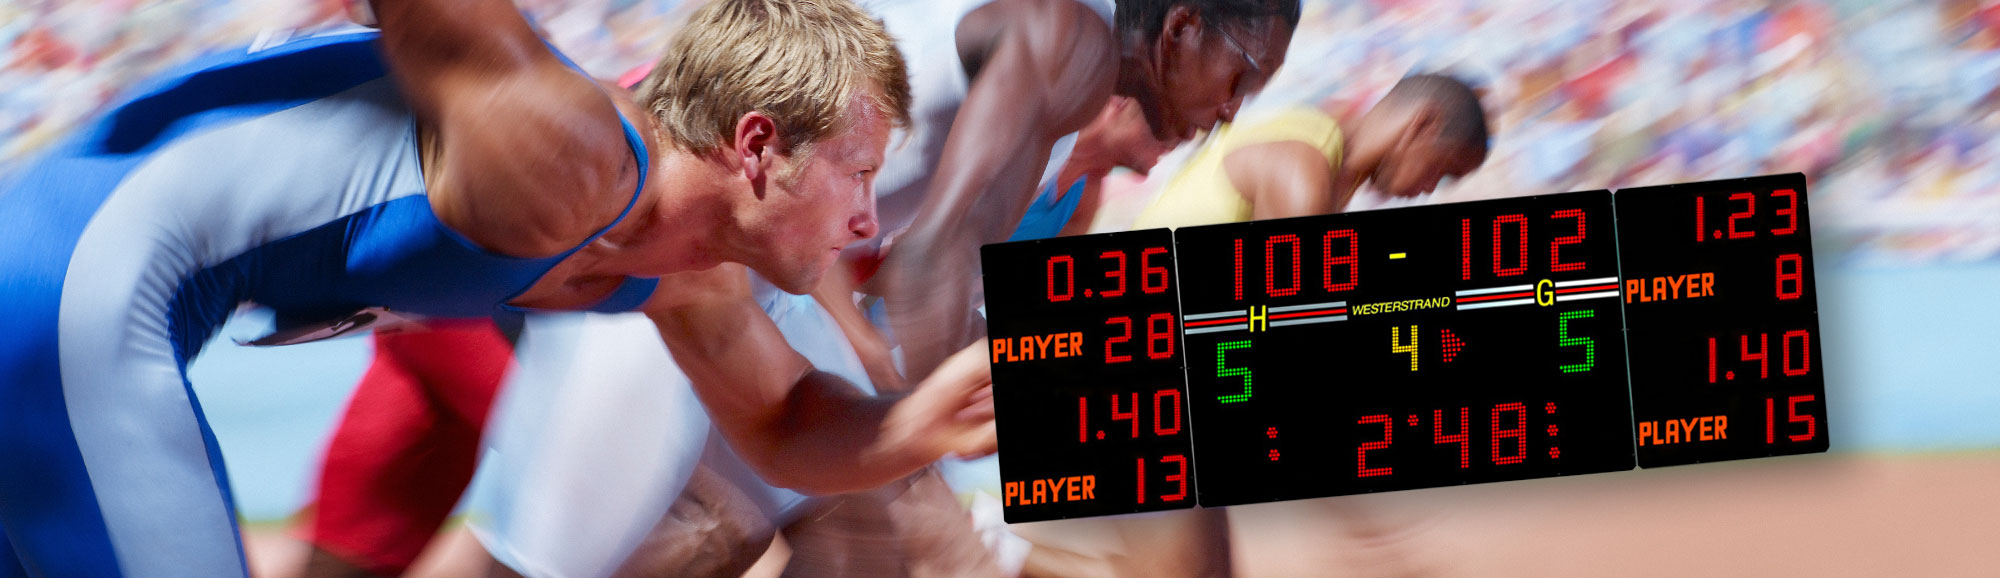 scoreboards image